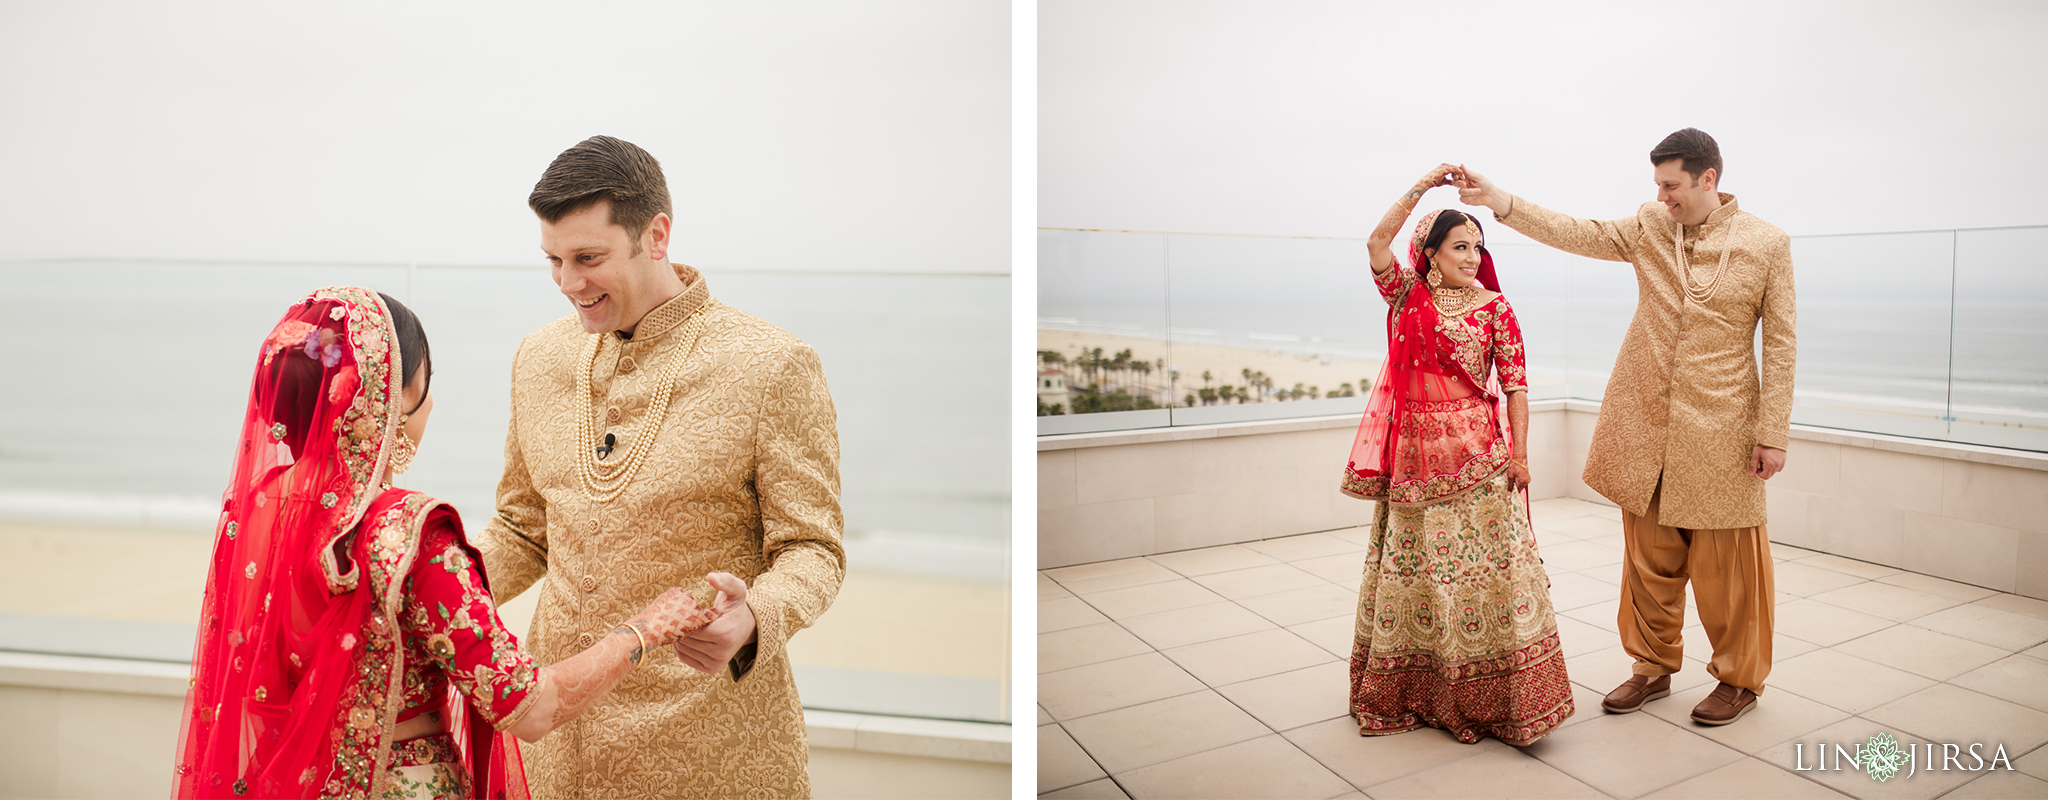 10 The Waterfront Beach Resort Orange County Indian Wedding Photography